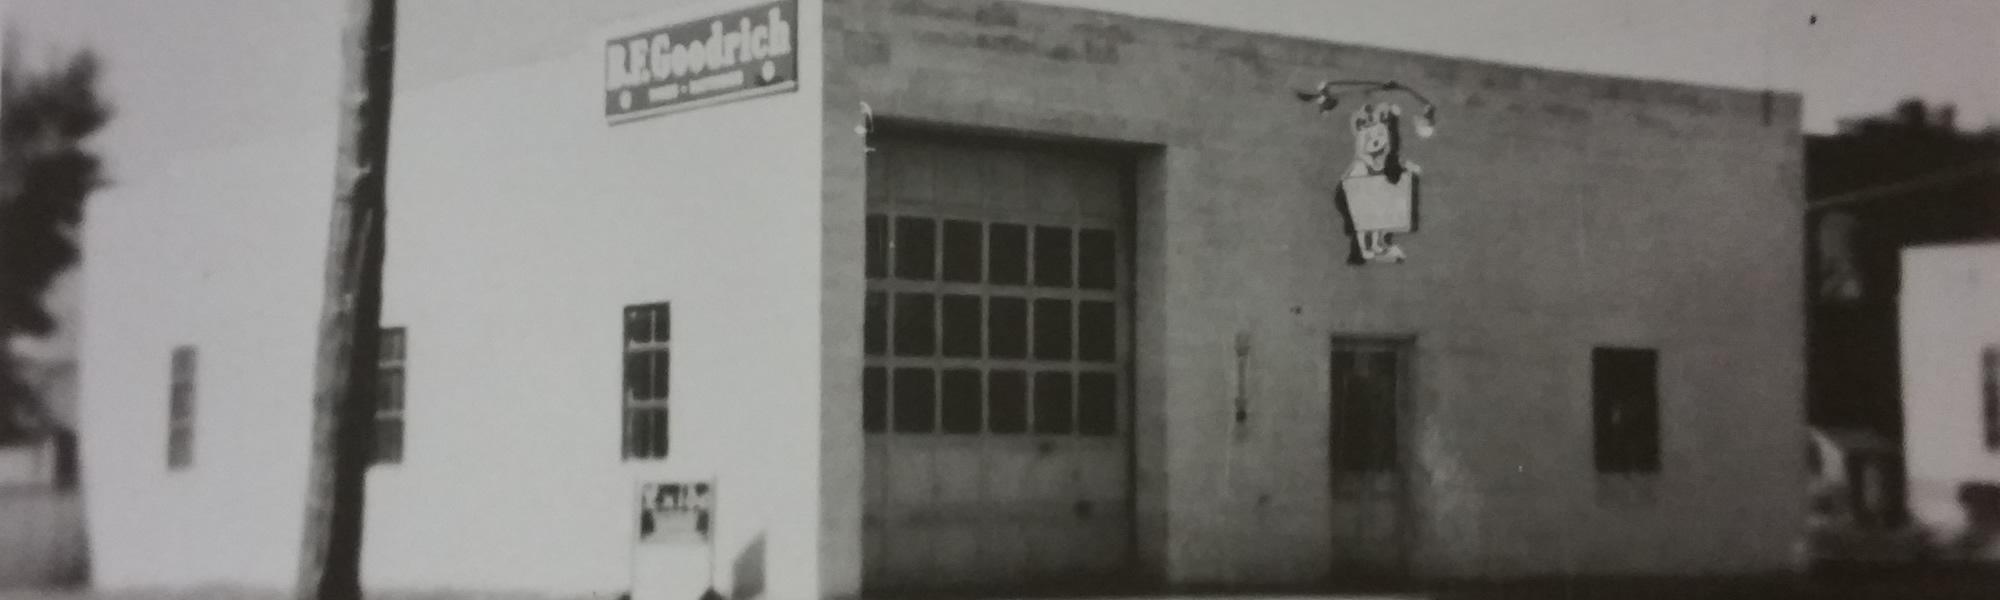 Lodermeiers History